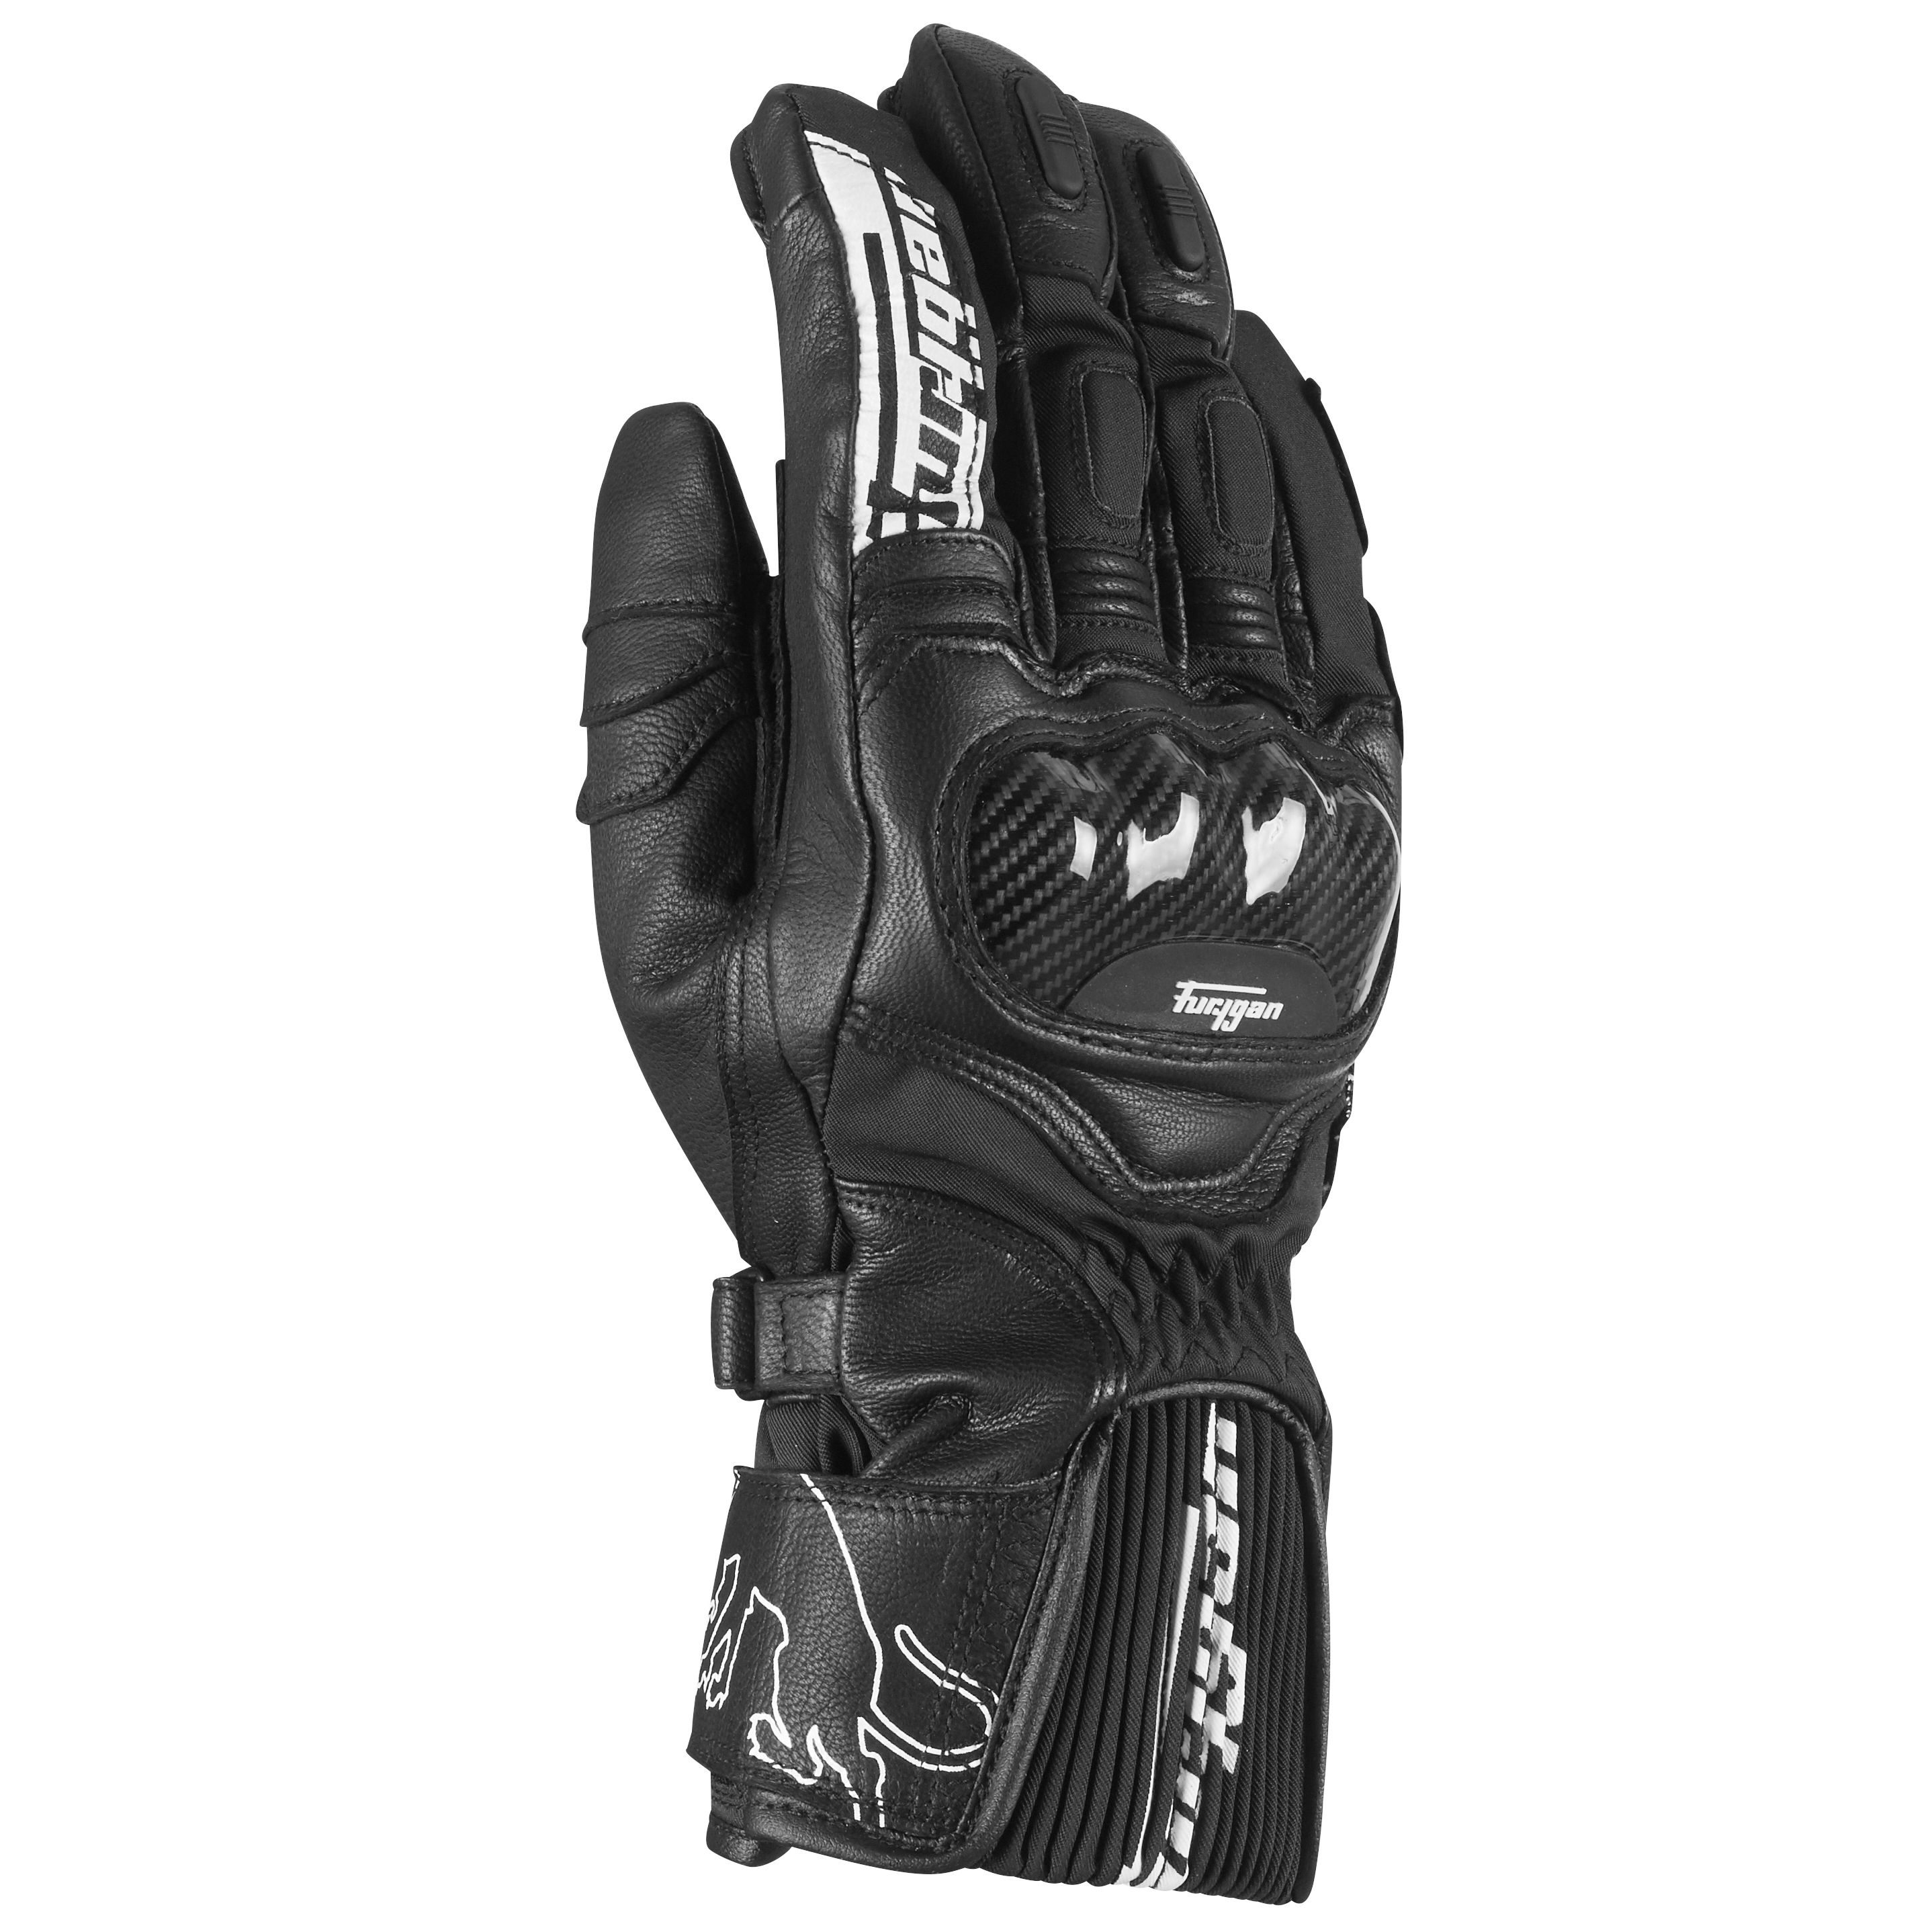 gants furygan mercury sympatex gants moto. Black Bedroom Furniture Sets. Home Design Ideas